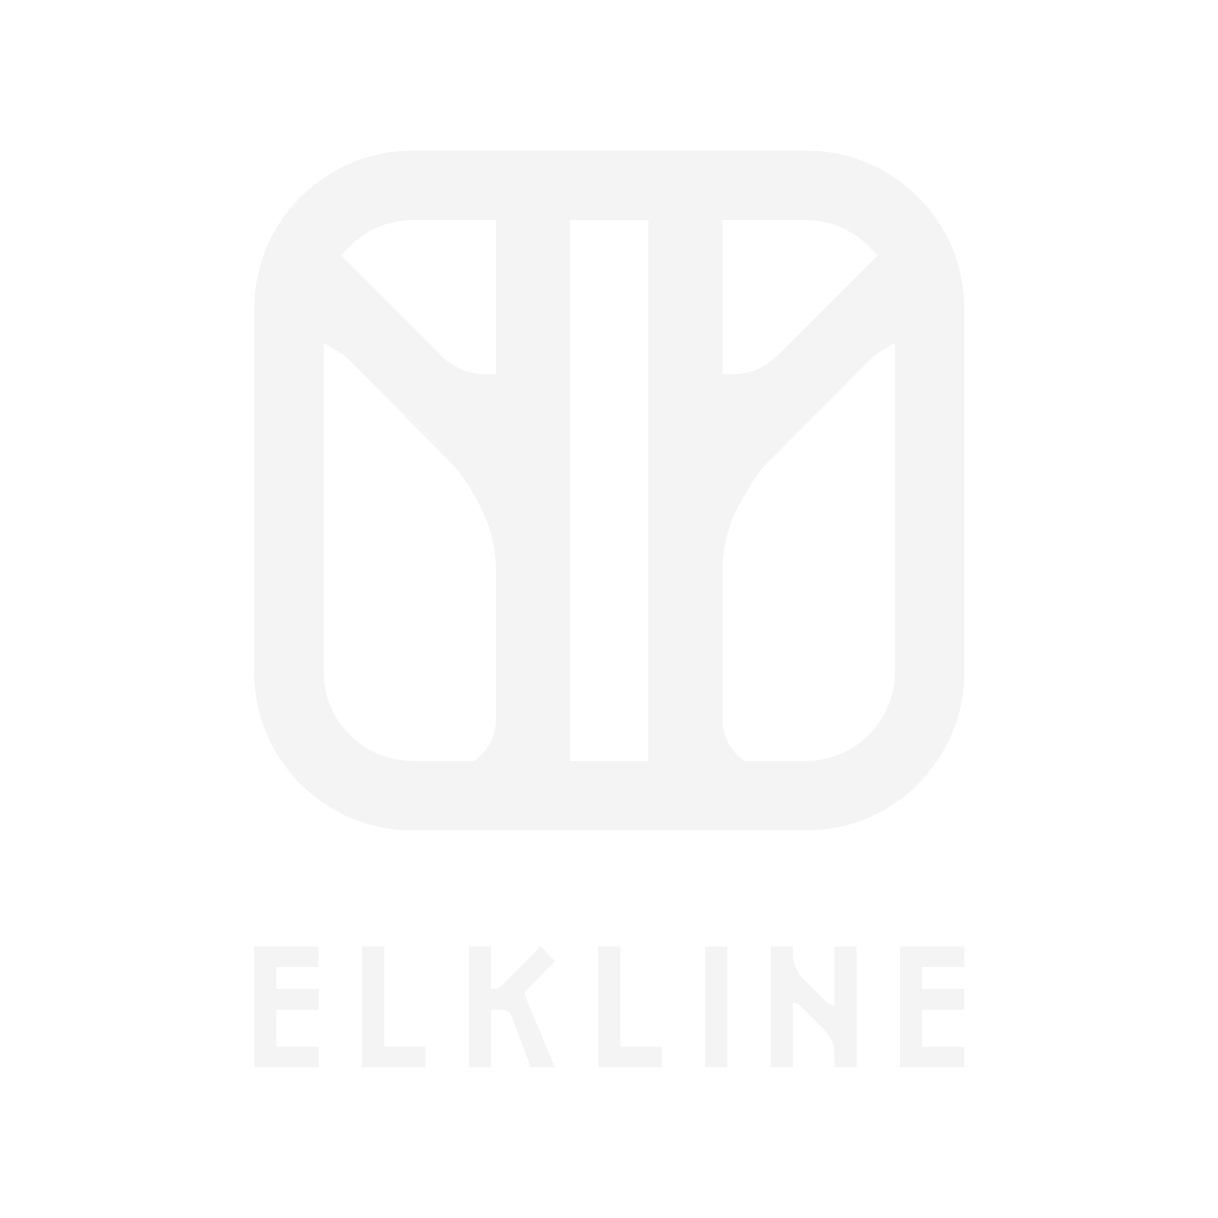 elk-stack2x1.png